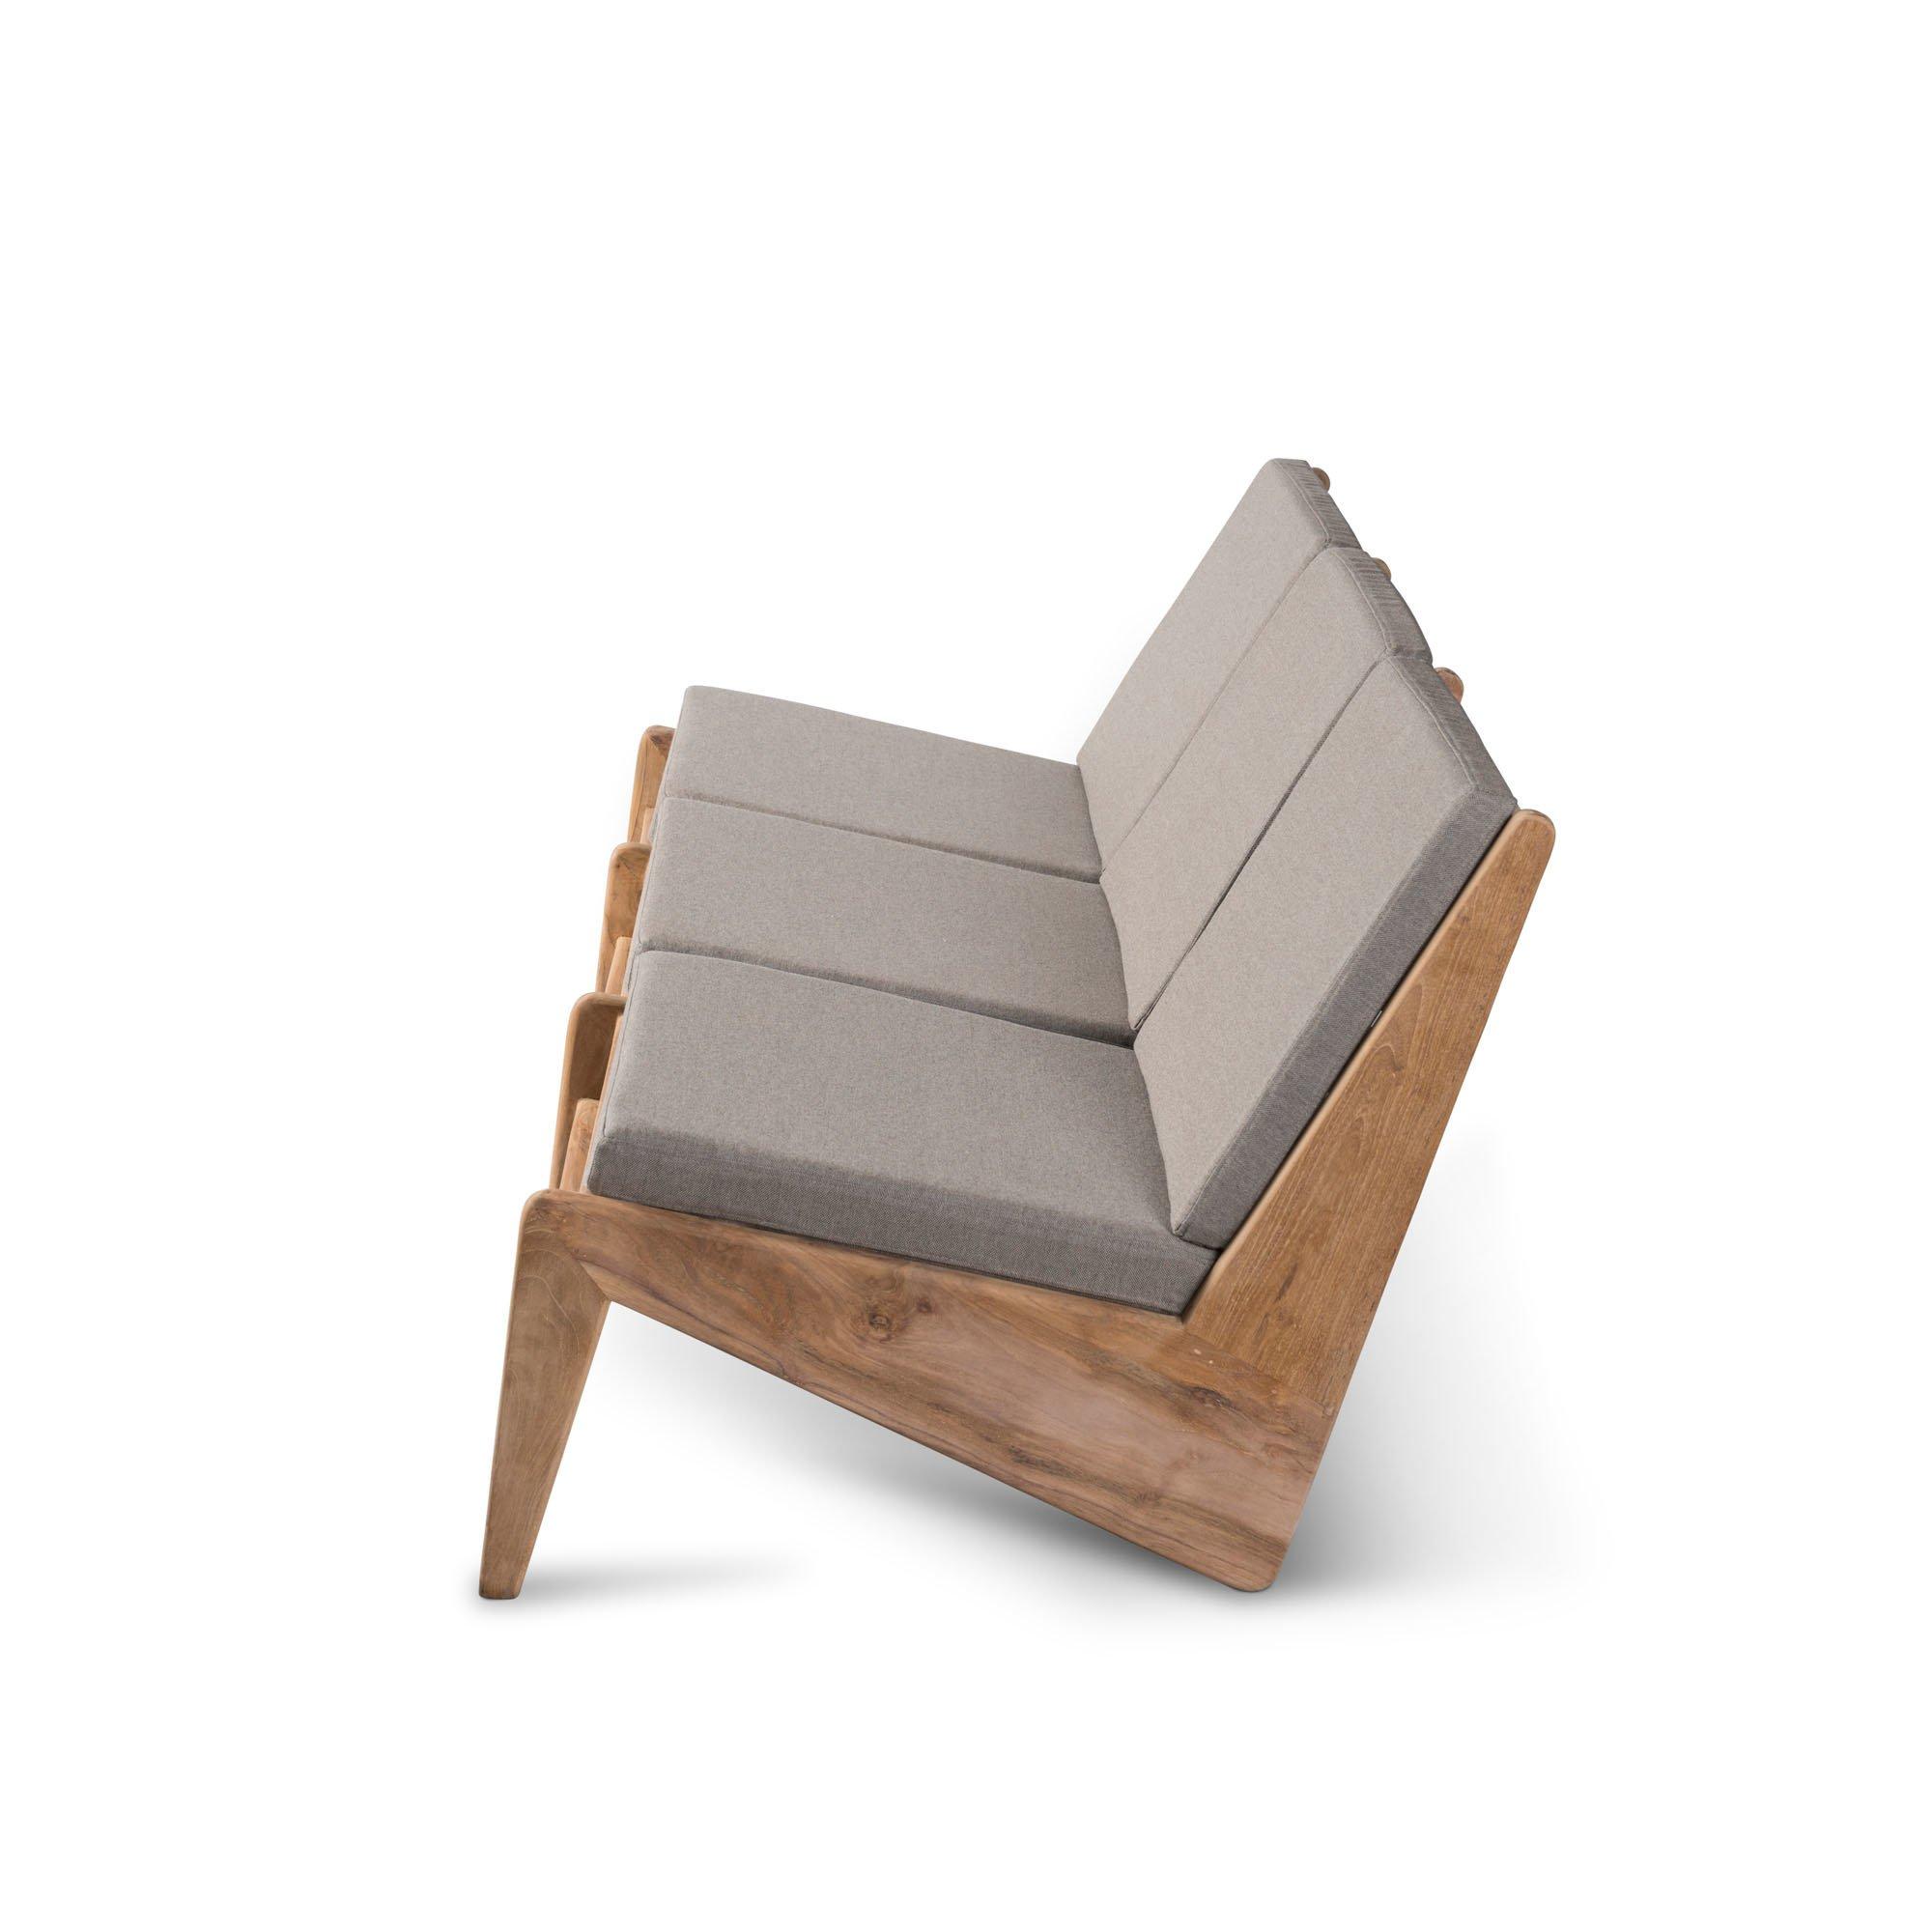 Kangaroo Chair  Bench 3 - Teak Outdoor with Cushion-3